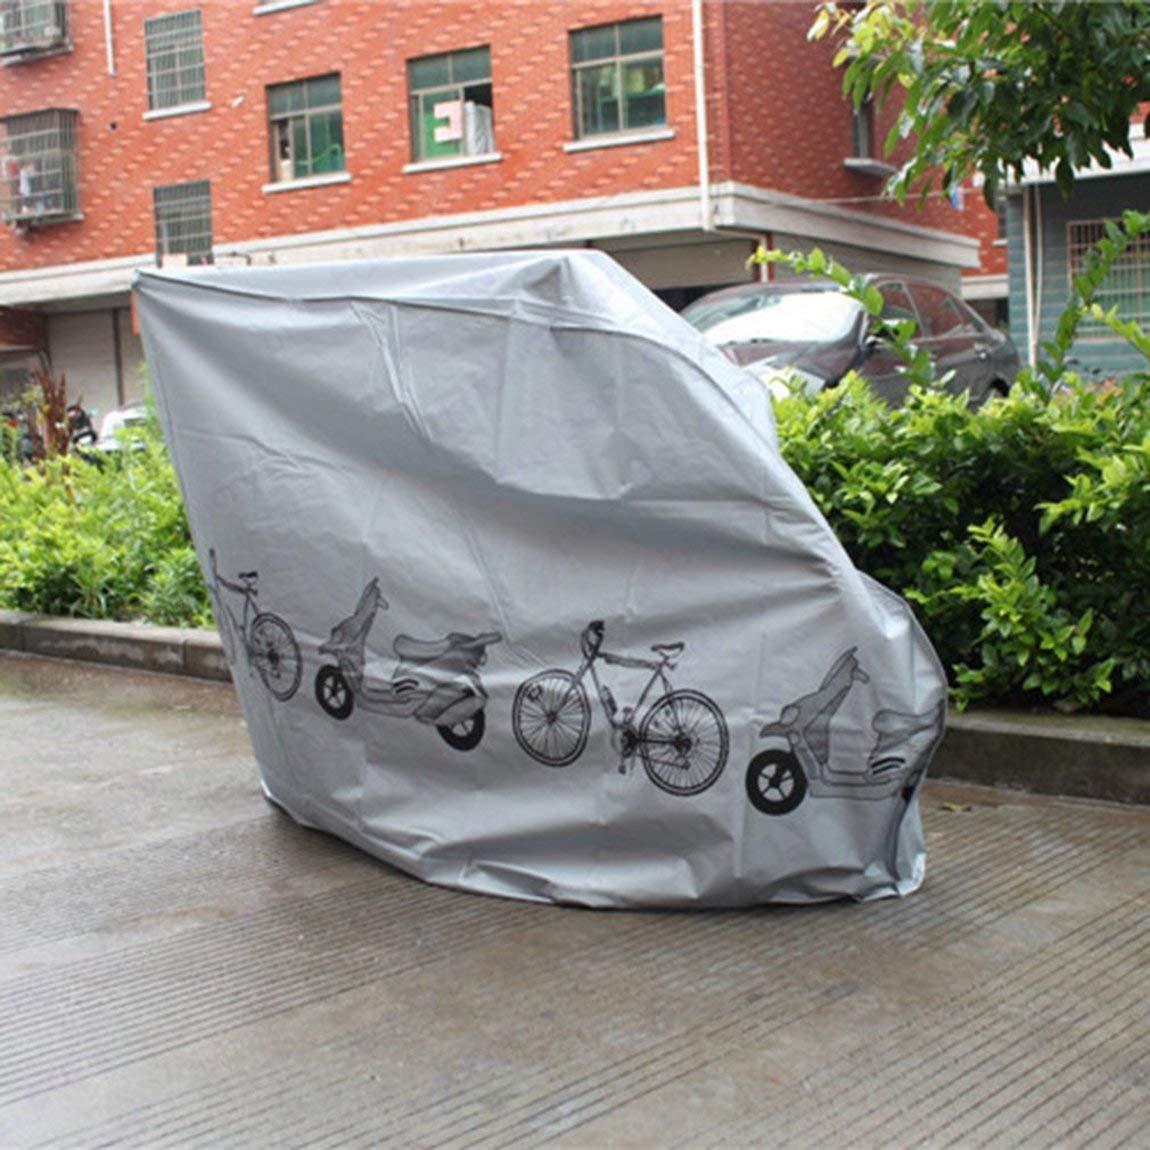 Plata 73JohnPol Cubierta Protectora contra el Polvo UV a Prueba de Polvo Bicicleta Lluvia Cubierta de Polvo Impermeable Gris Exterior para Bicicleta Ciclismo